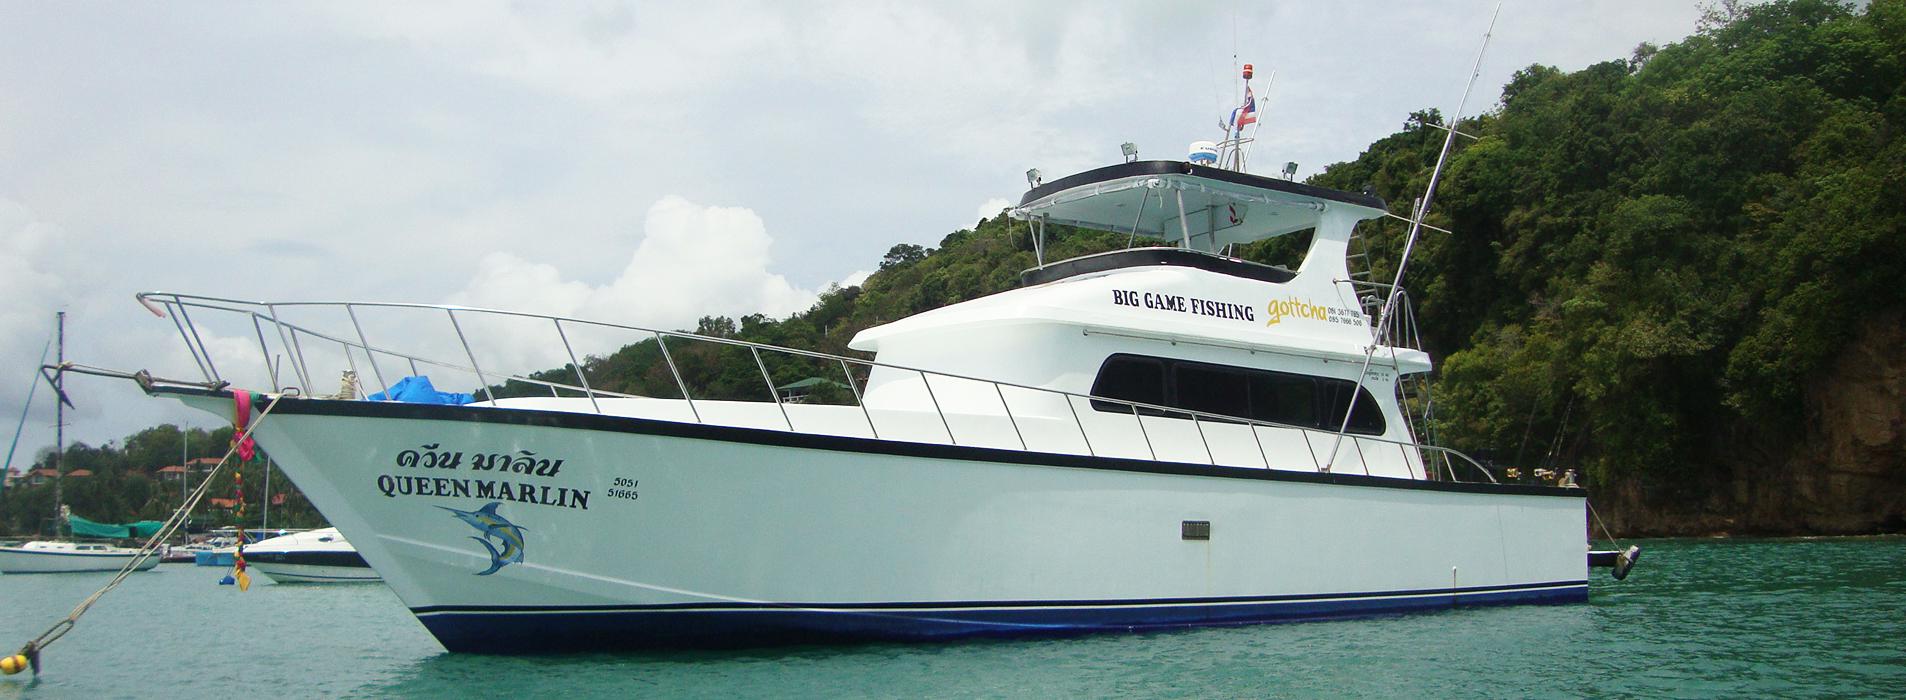 Queen Marlin Phuket Fishing Charter